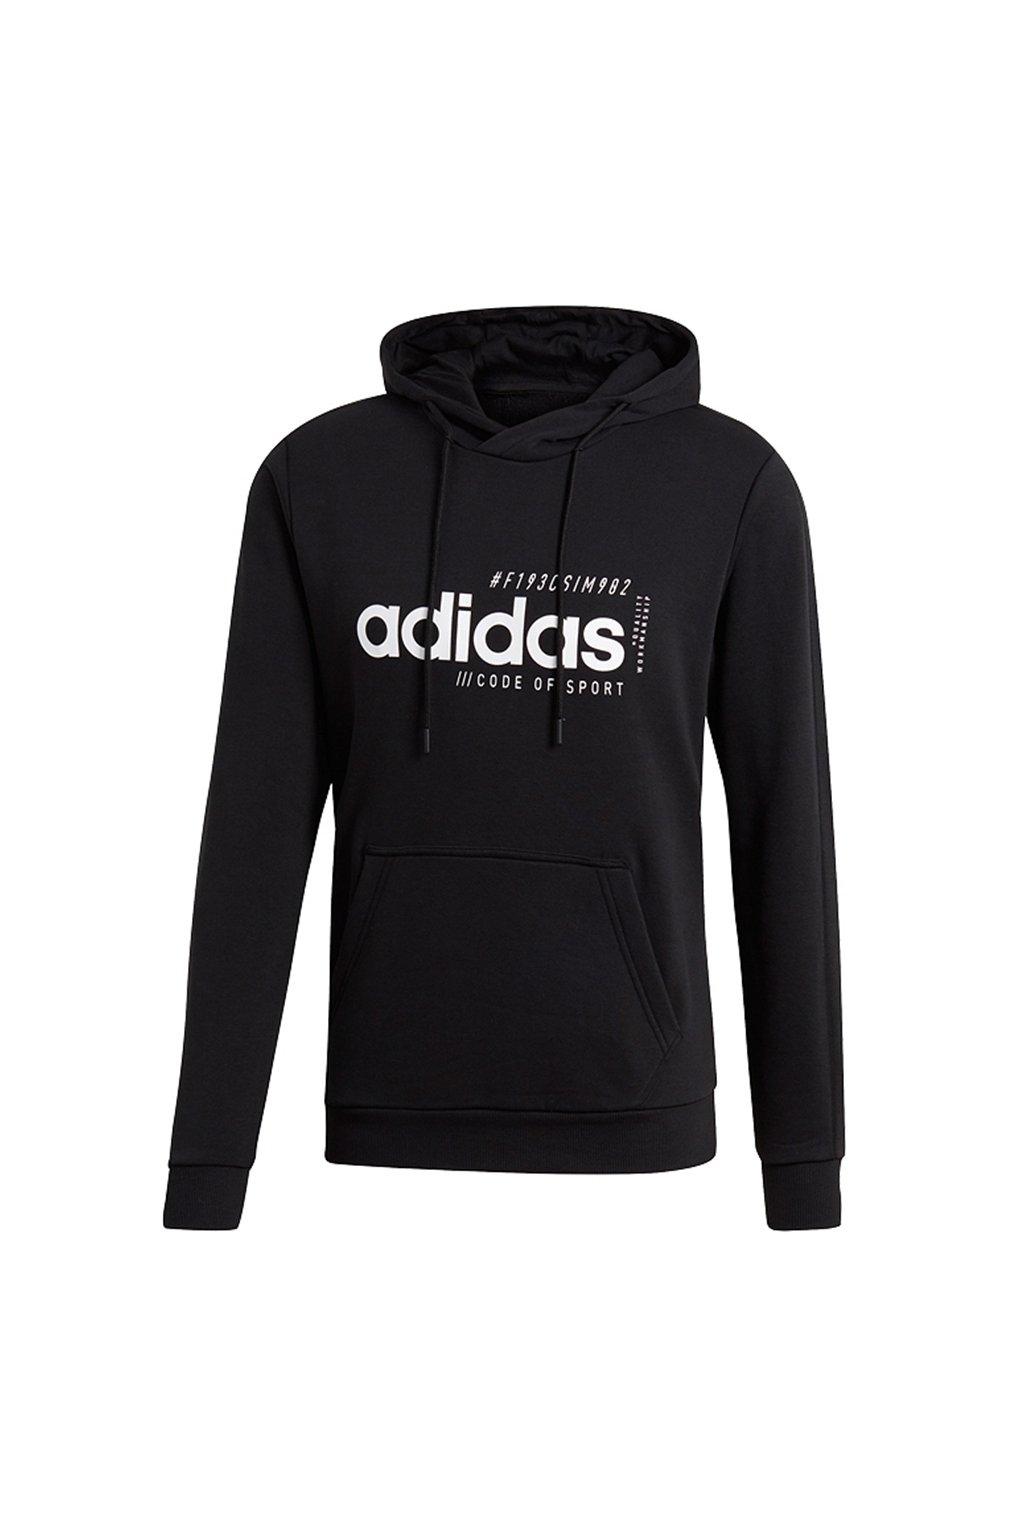 Pánska mikina Adidas M Briliant Basics, čierna EI4622